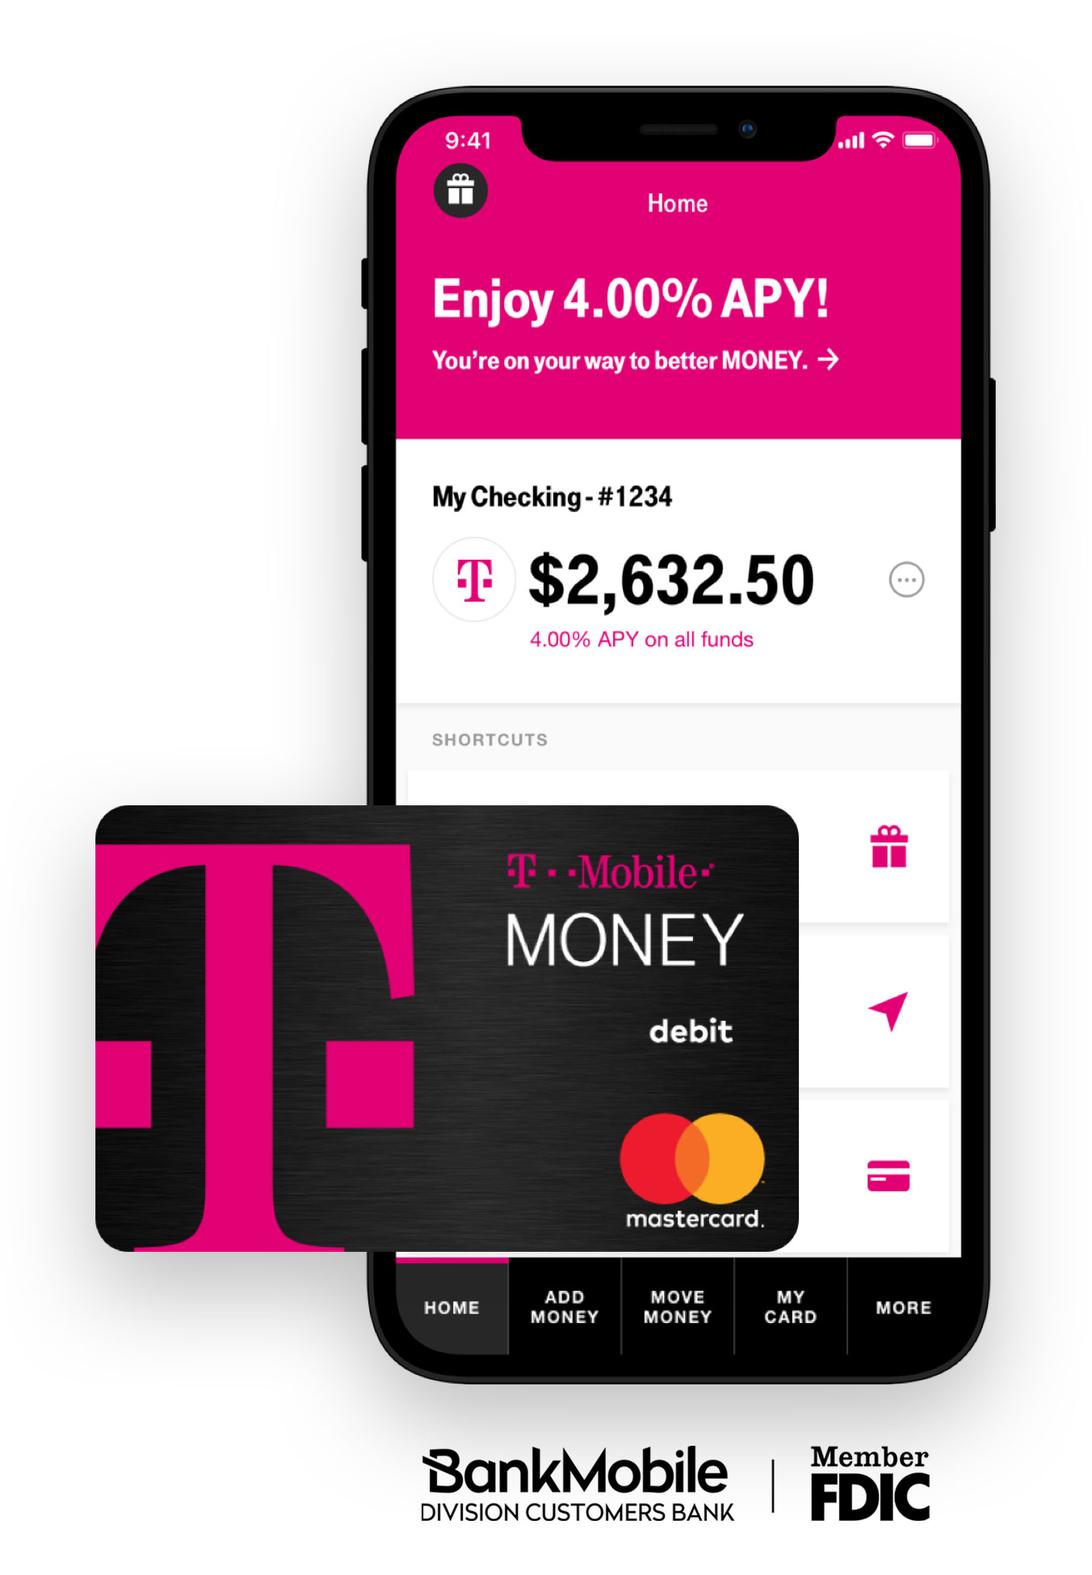 tmobile-money-app